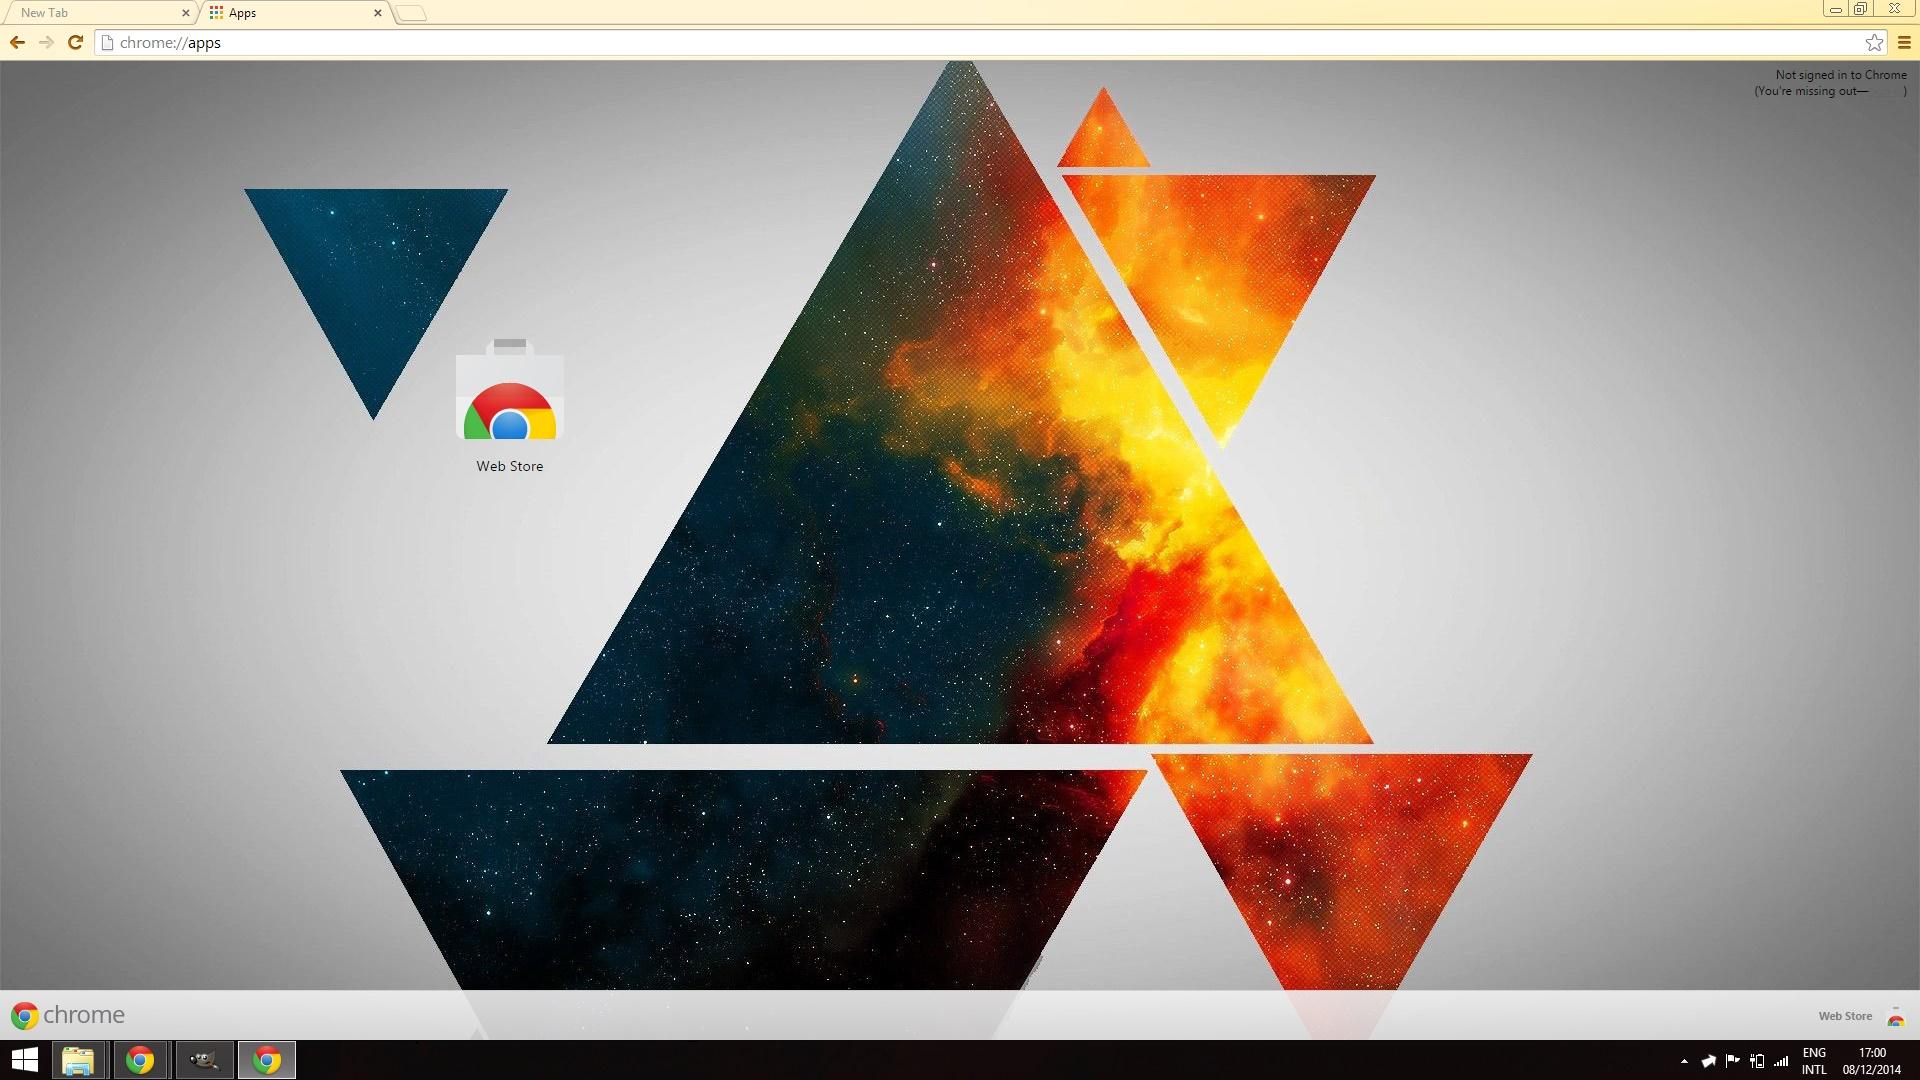 Google chrome themes universe - Shiun06 1 0 Triangle Theme By Eadorimthryth